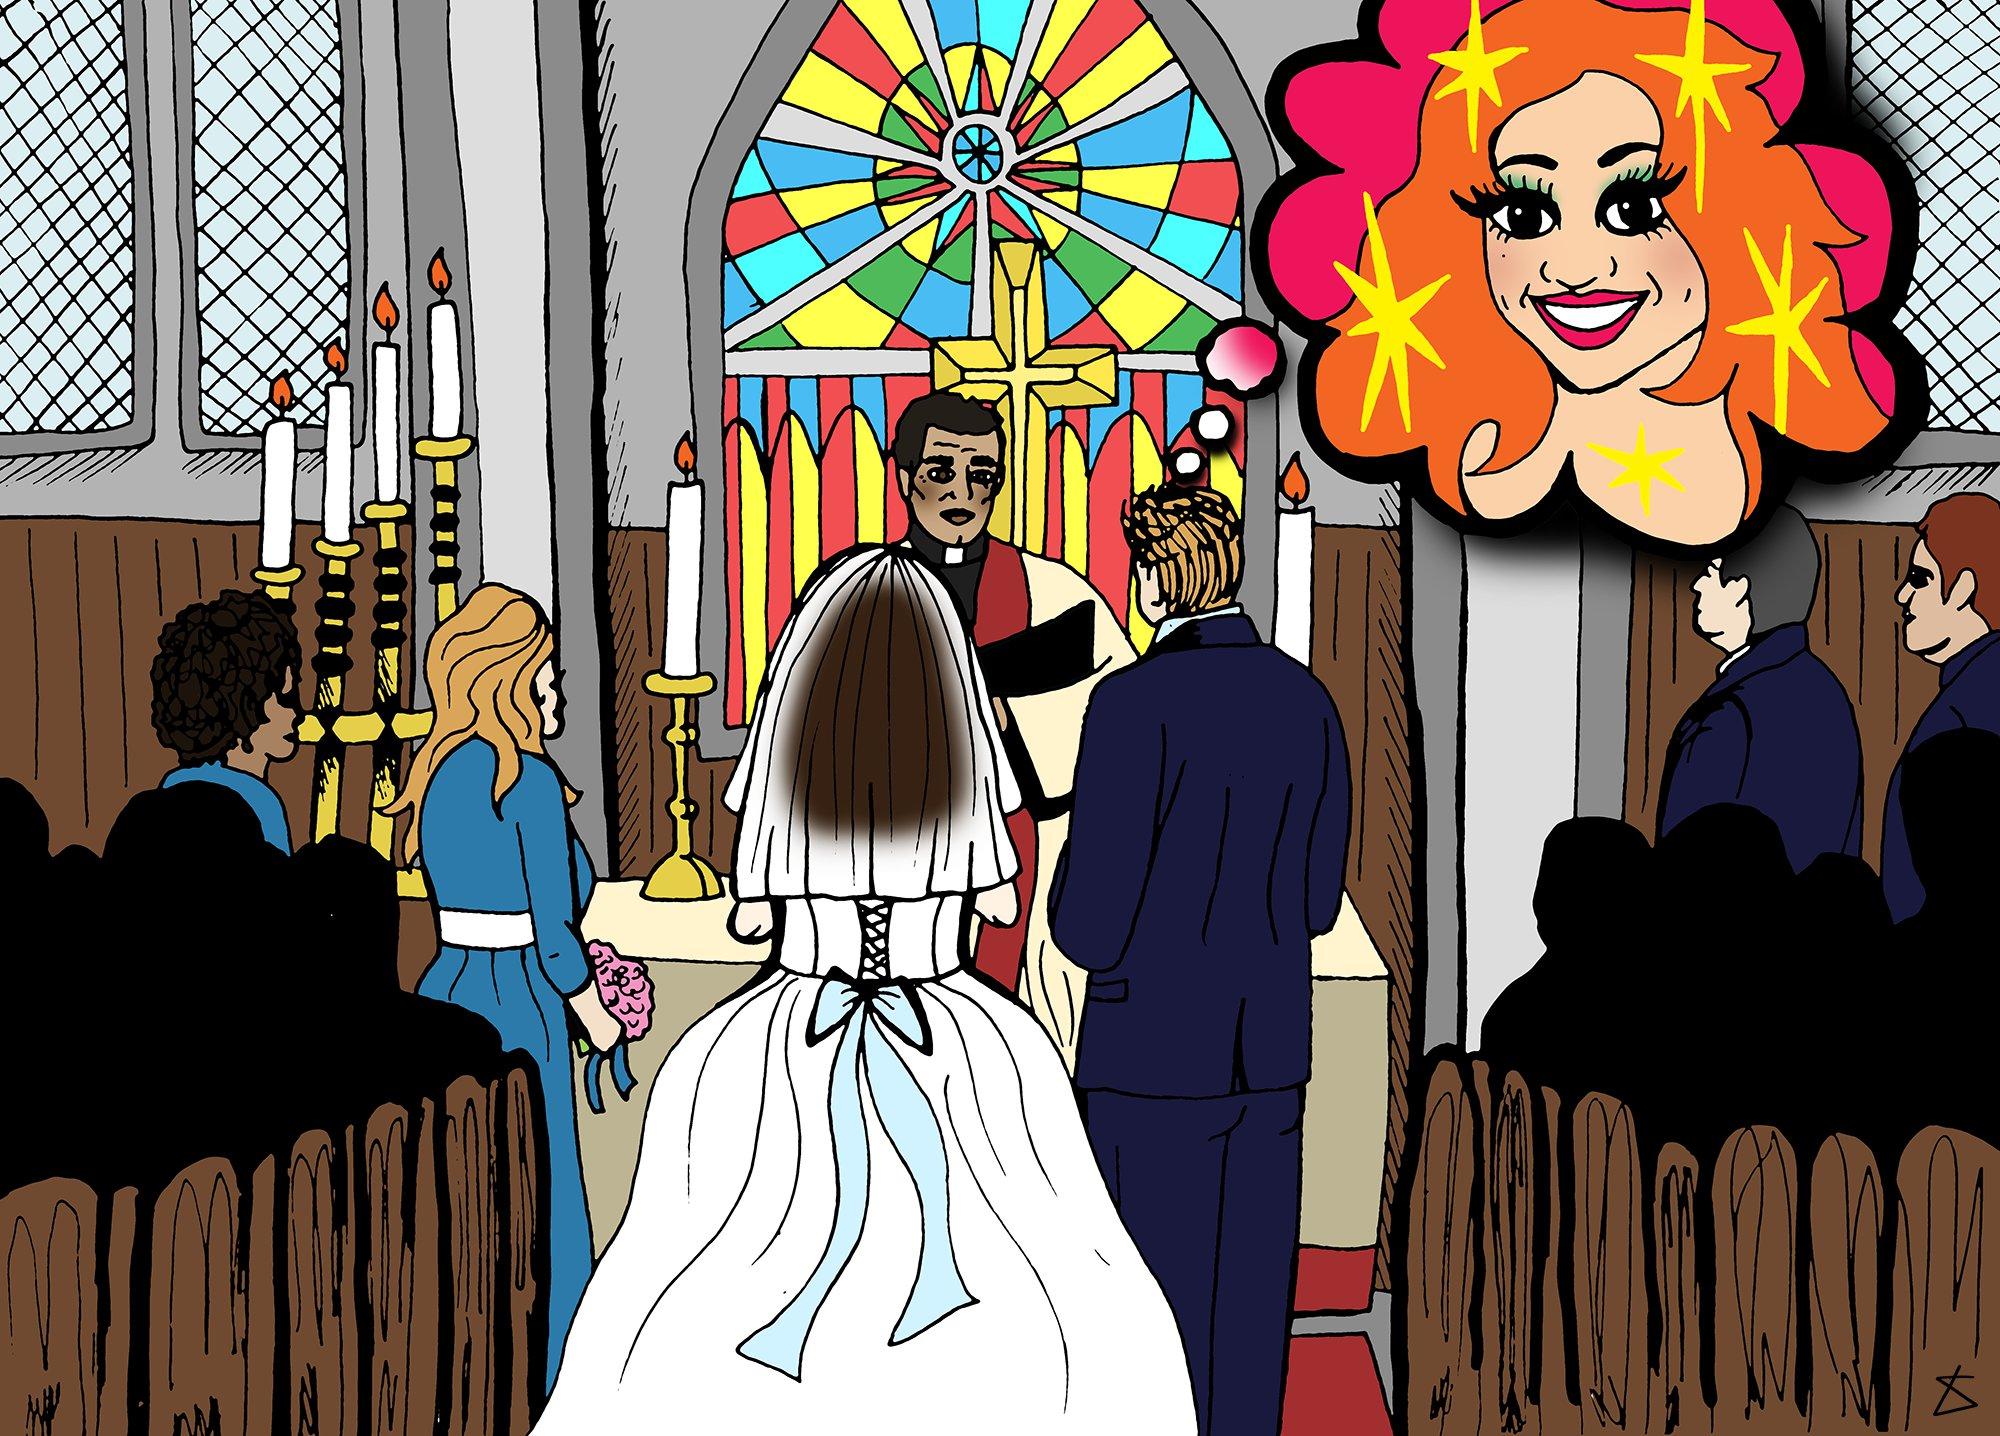 Dear Prince Harry, I wish I'd had the balls to invite my ex to my wedding